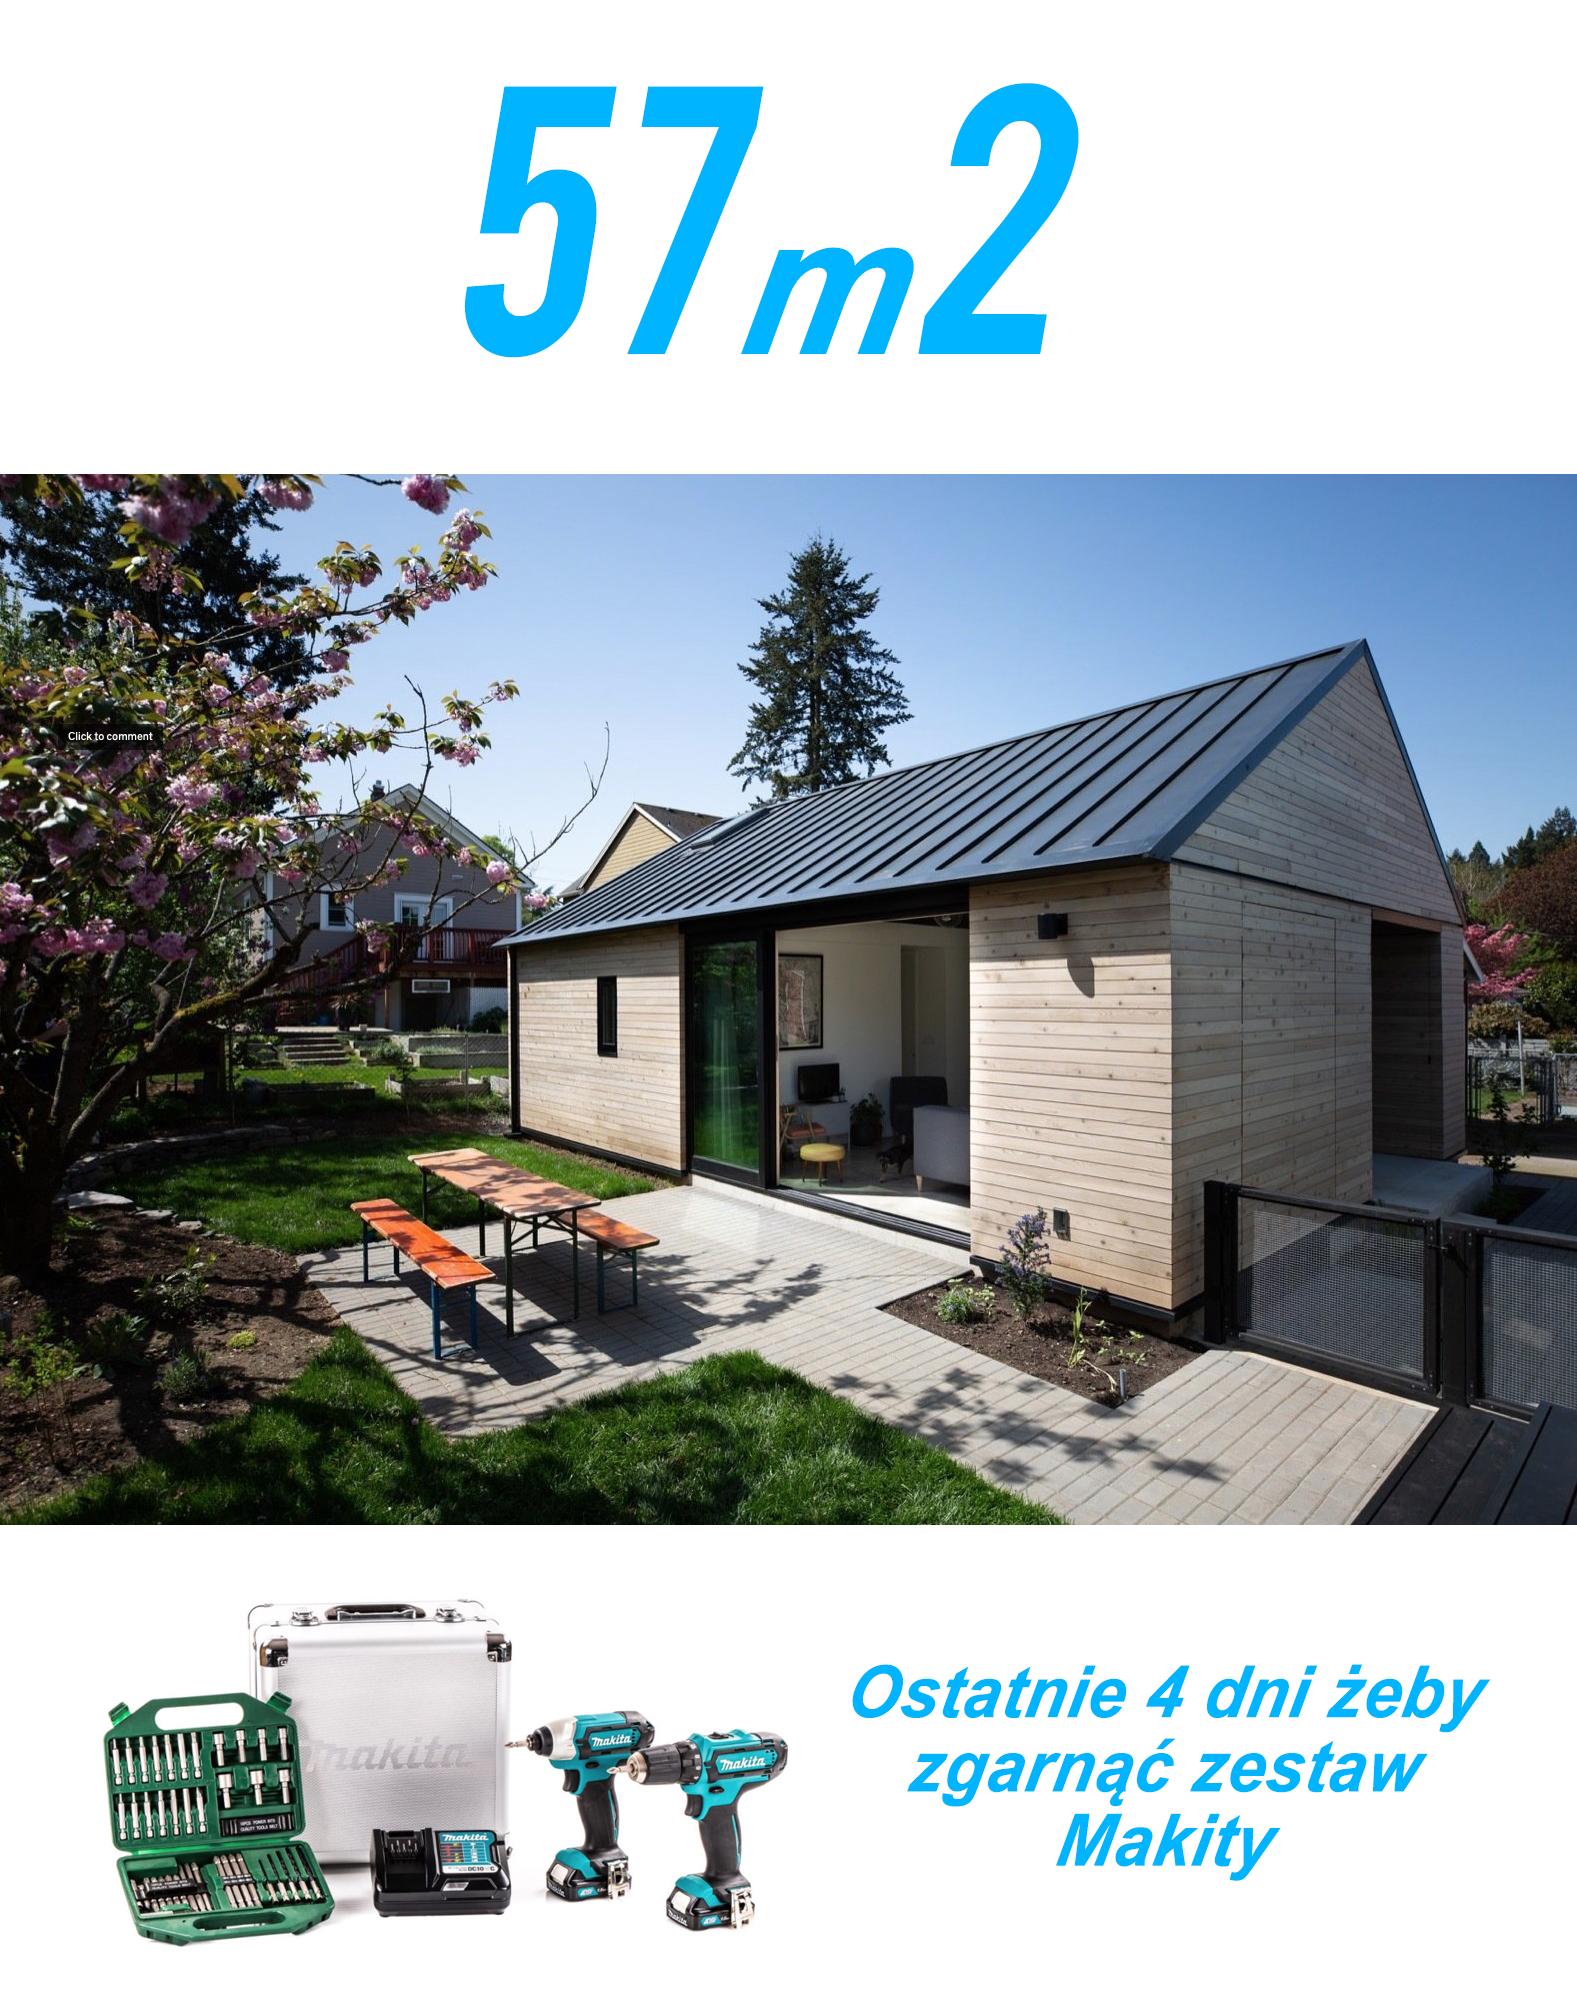 Projekt małego domu do 100m2, 56m2